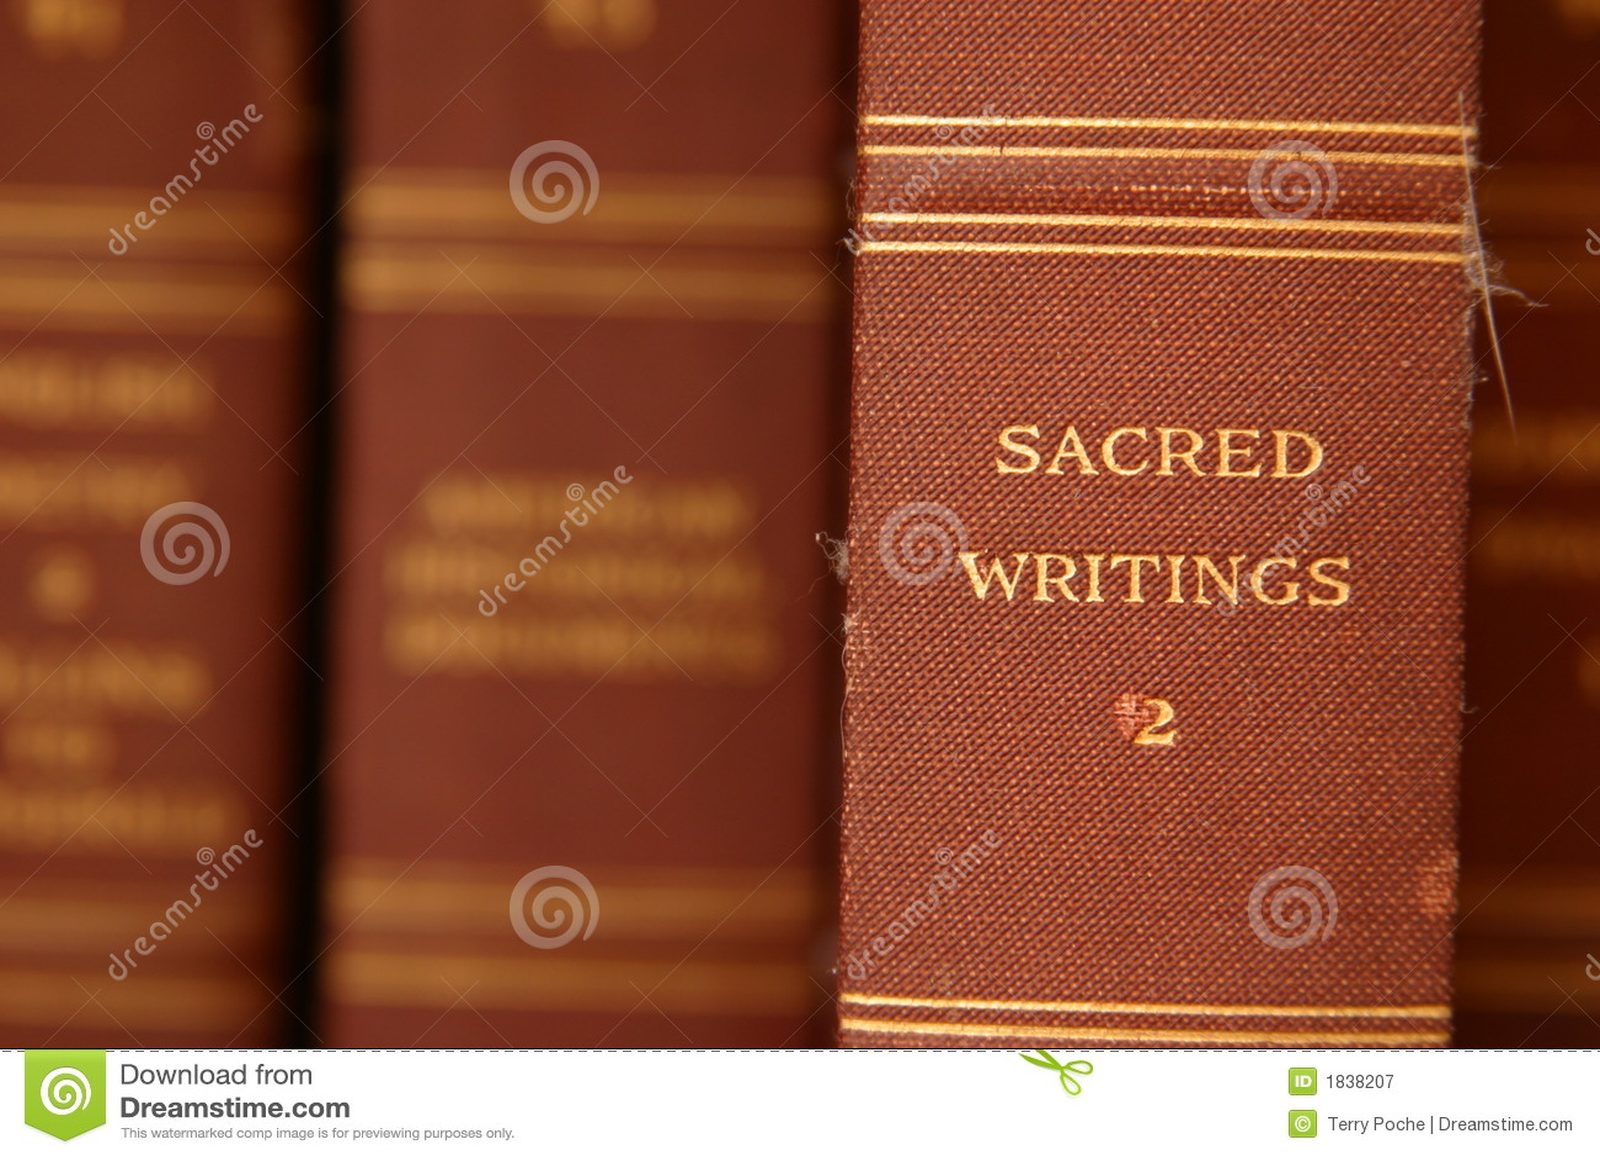 Sacred Writings Royalty Free Stock Photography - Image: 1838207